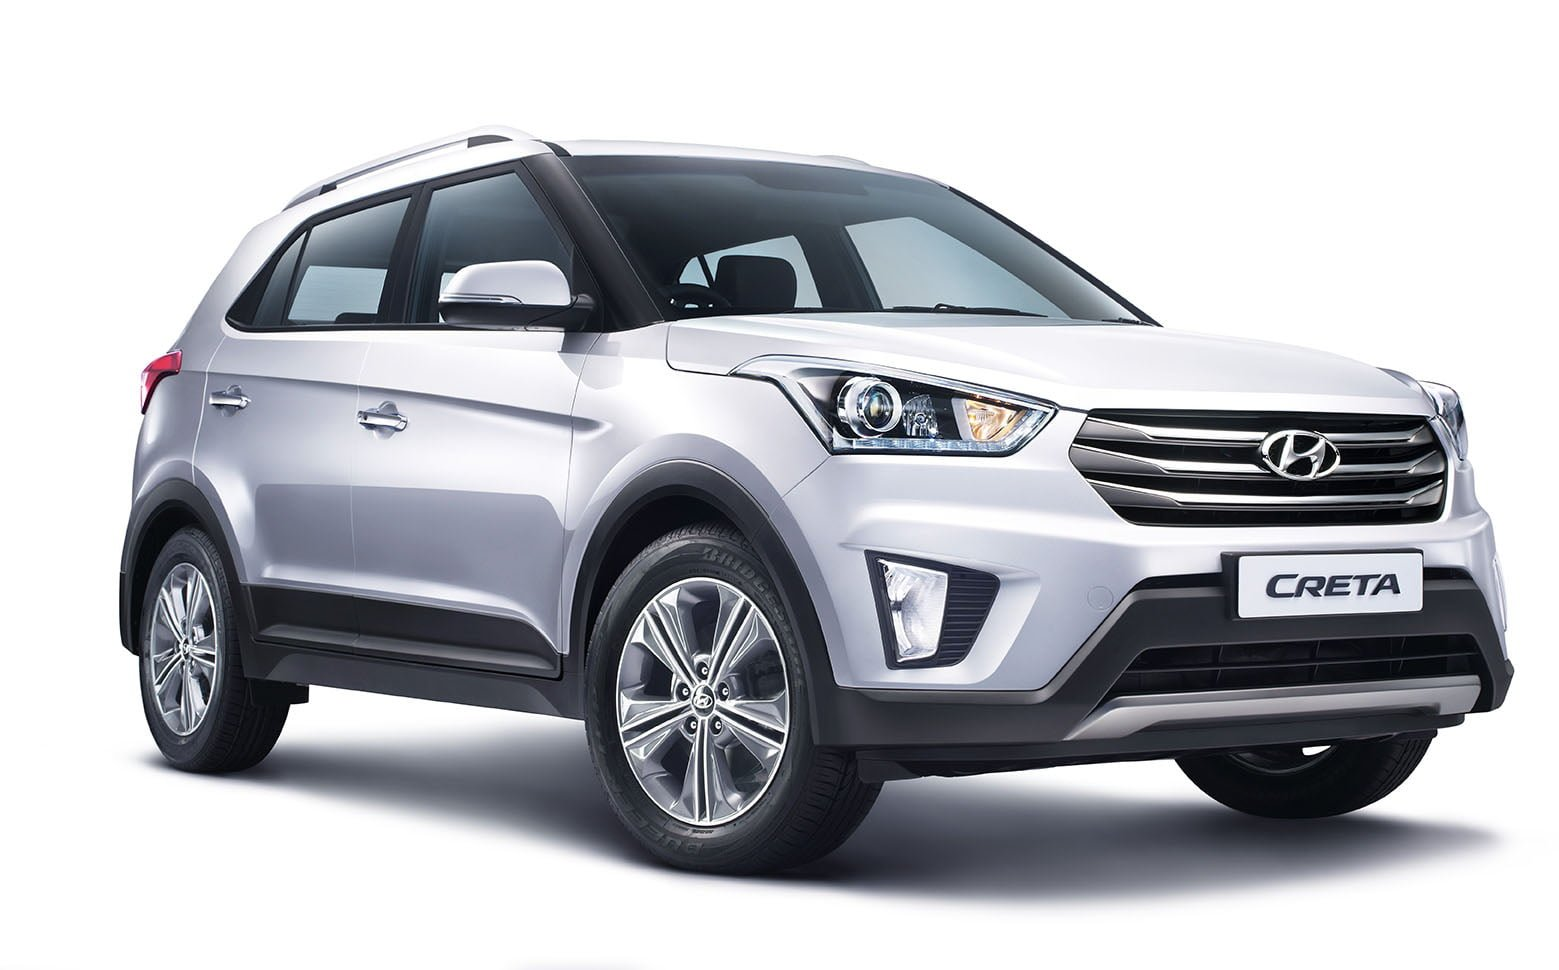 Hyundai creta price starts from 8 59 lakhs launched in india - Hyundai Creta India Pics 1